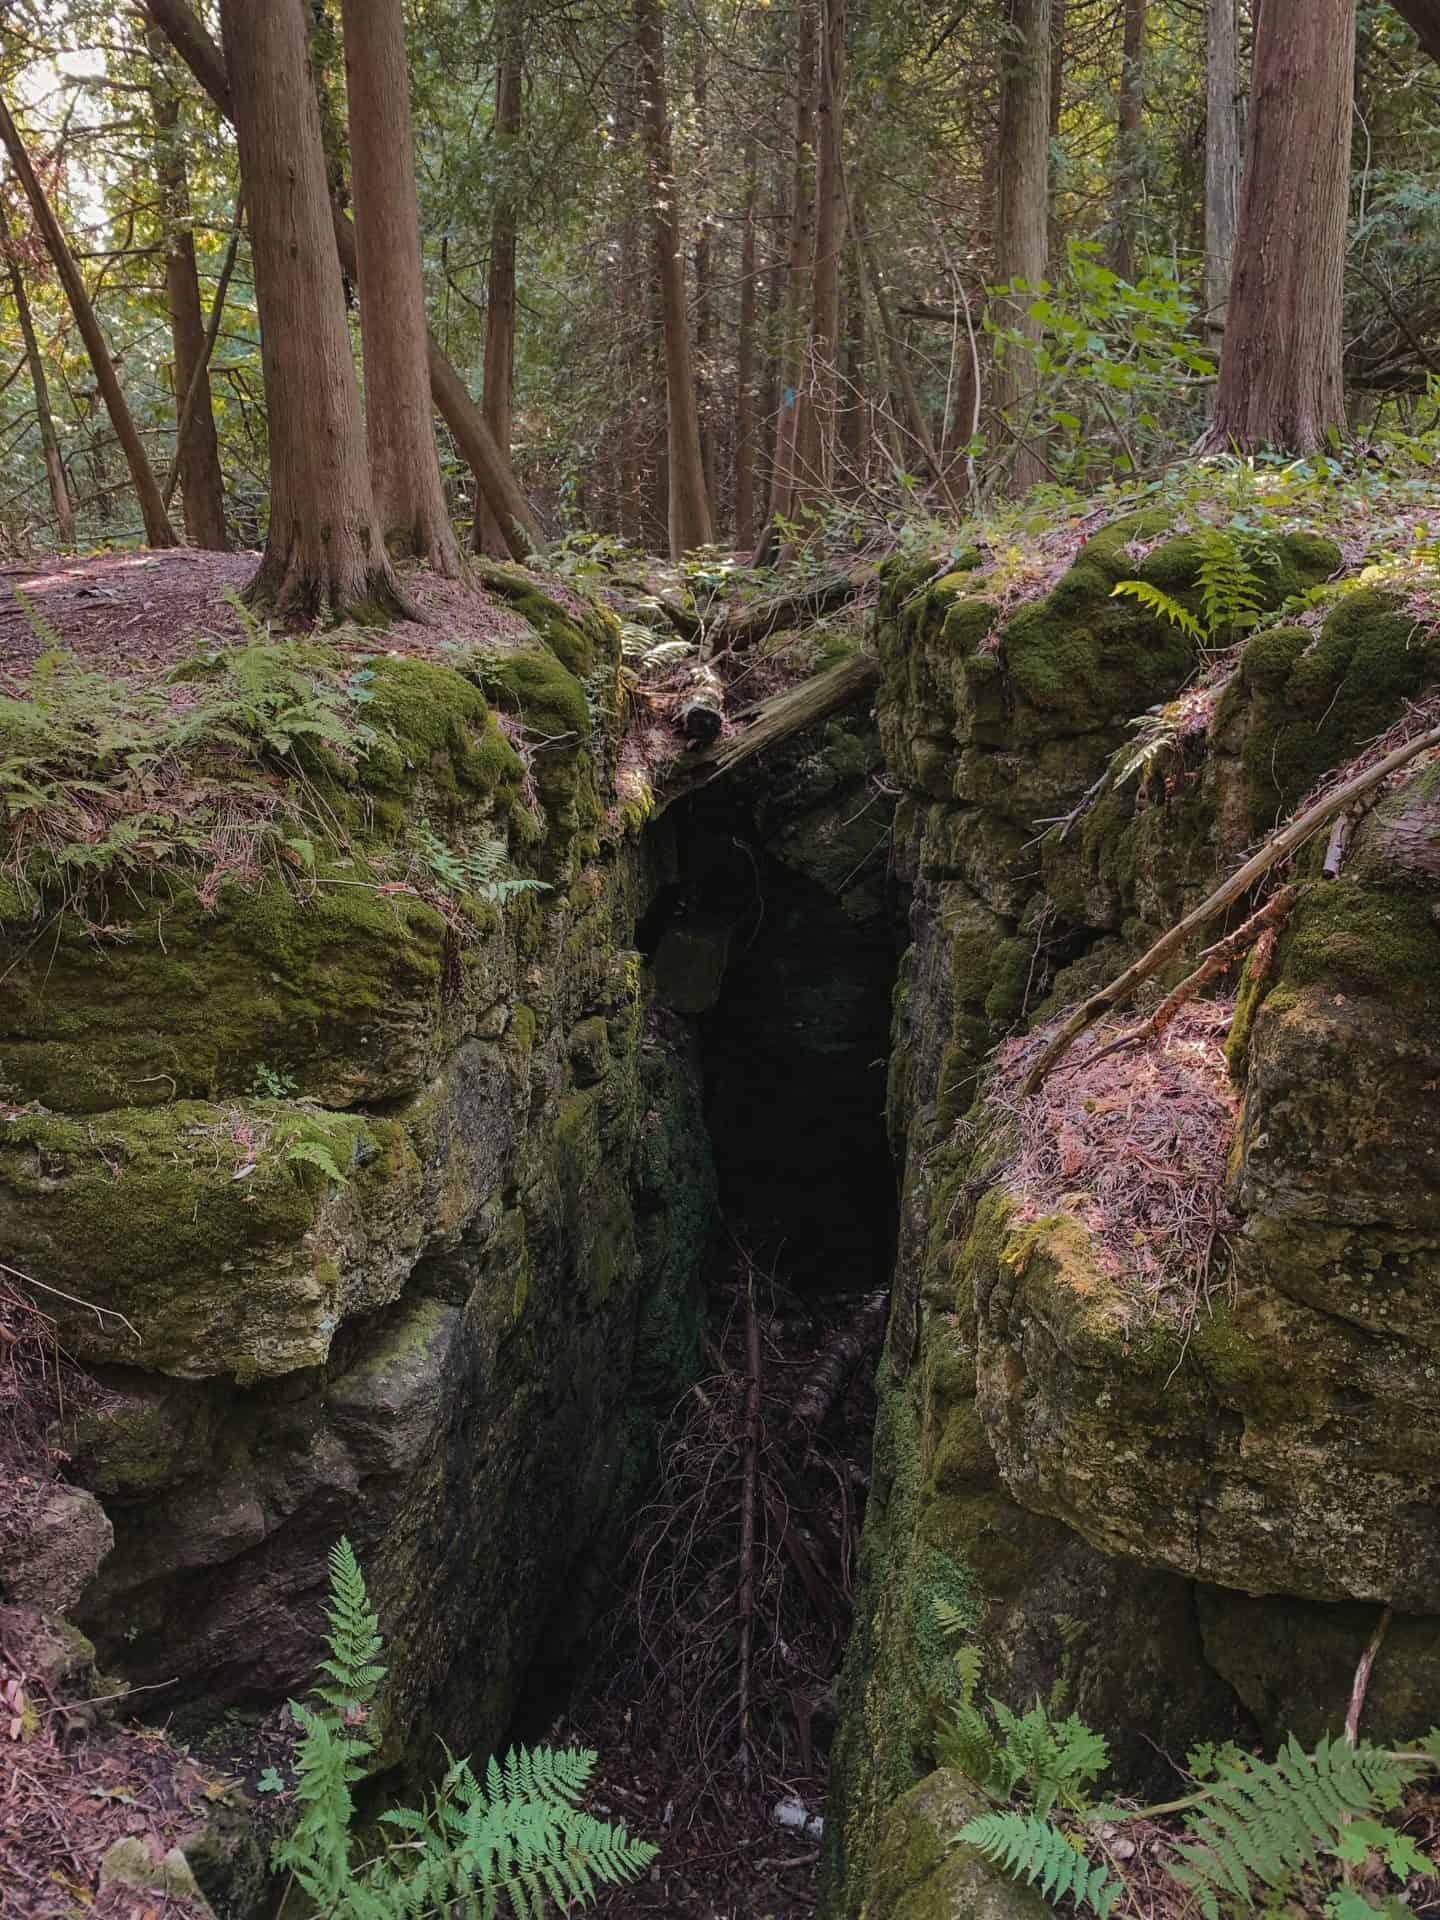 Crevice system at Split Rock Narrows in Orangeville, Ontario